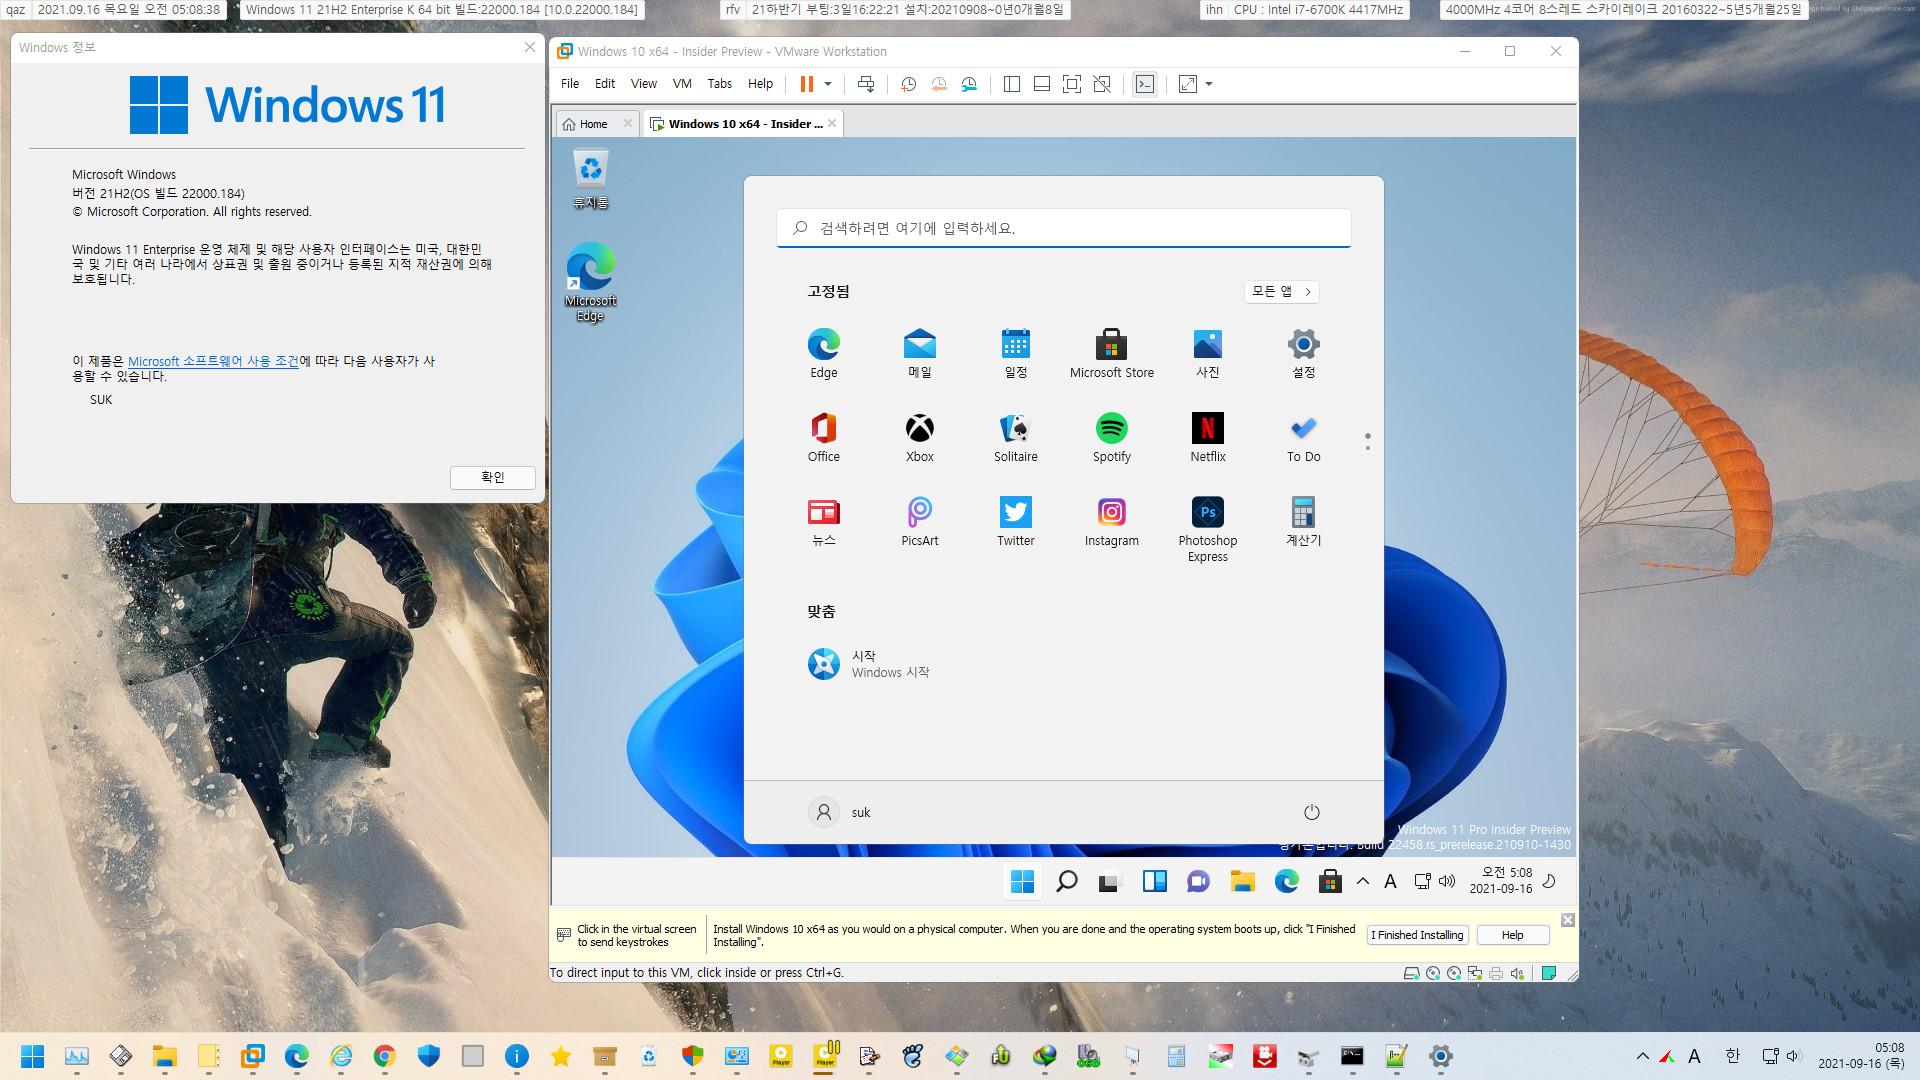 Windows 11 인사이더 프리뷰 - 버전 Dev (OS 빌드 22458.1000) 나왔네요 - 개발자 채널 - uup 사이트 2군데 전부 한국어 iso가 install.wim 단계에서 오류가 생겨서 윈도우 업데이트에서 uup 파일들 다운로드하여 iso 만드는데 성공했습니다 2021-09-16_050839.jpg